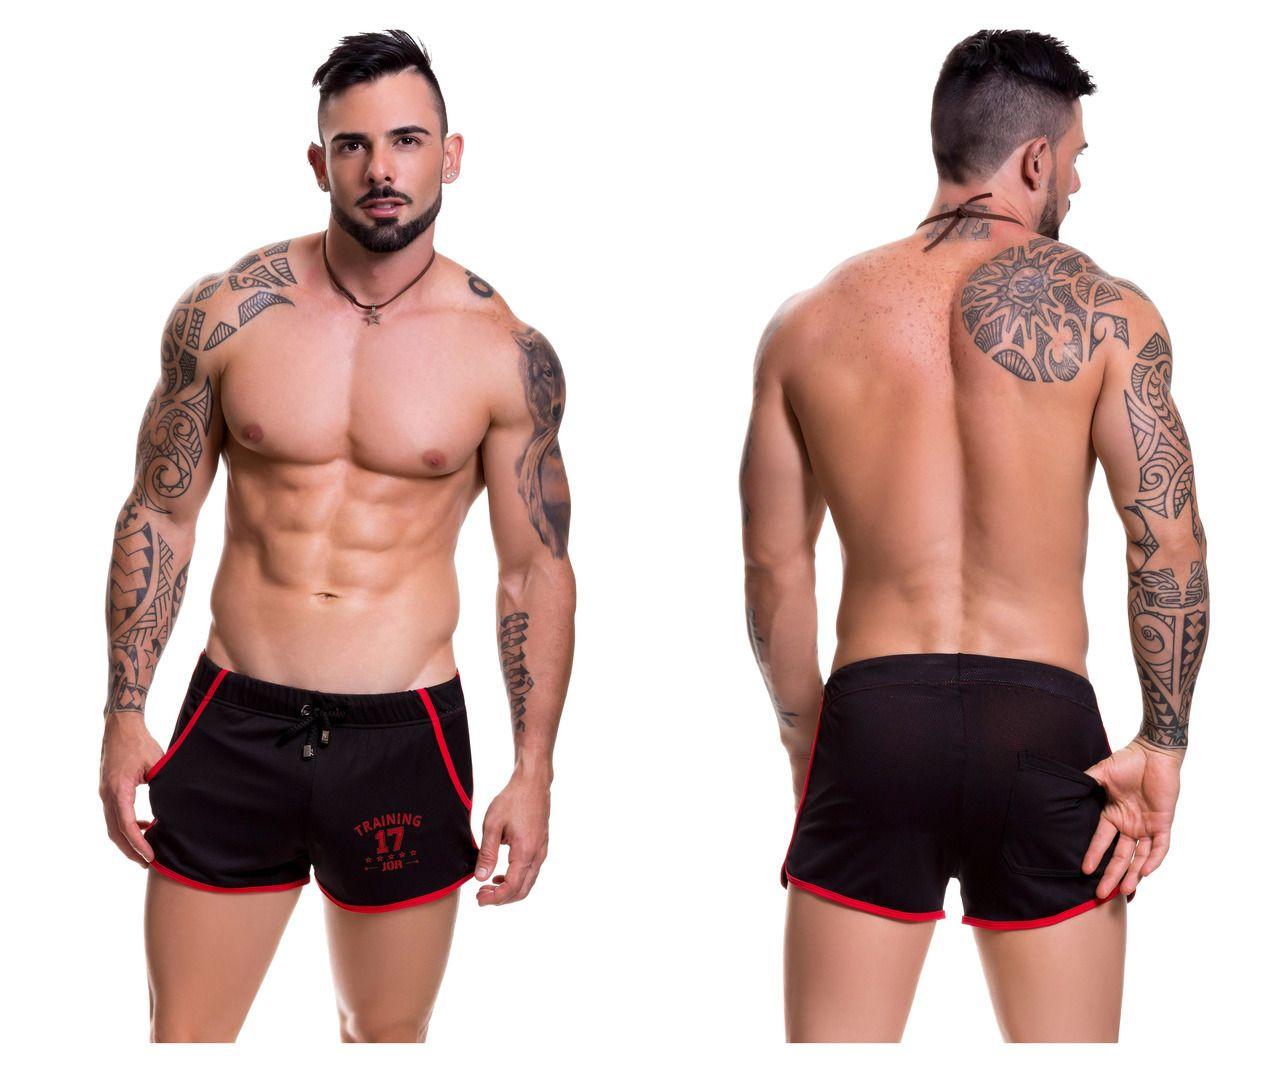 39b98a92a61f 0300 JOR Ultra Athletic Shorts Color Black - Fetish Underwear Sales ...